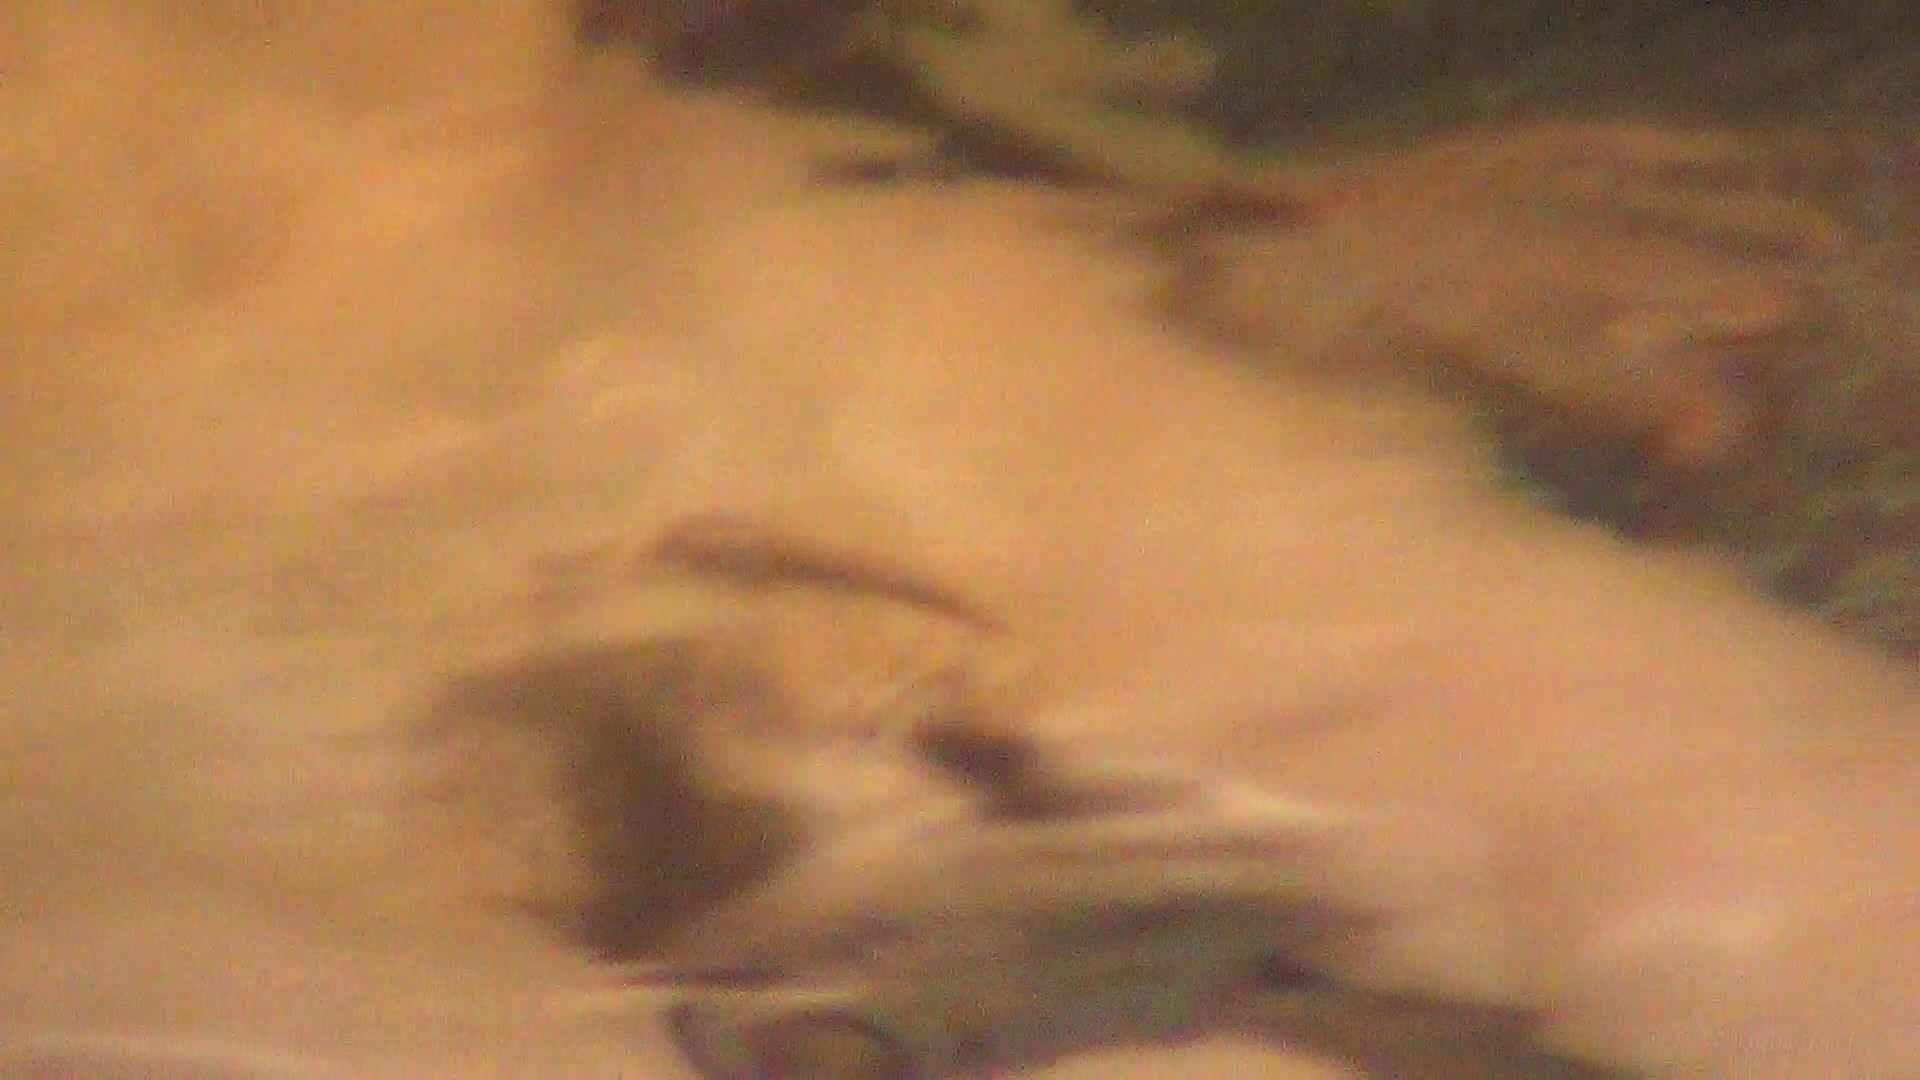 Vol.47 oyakoで登場 スレンダーだけどしっかりしたオッパイ 0   0  64画像 48